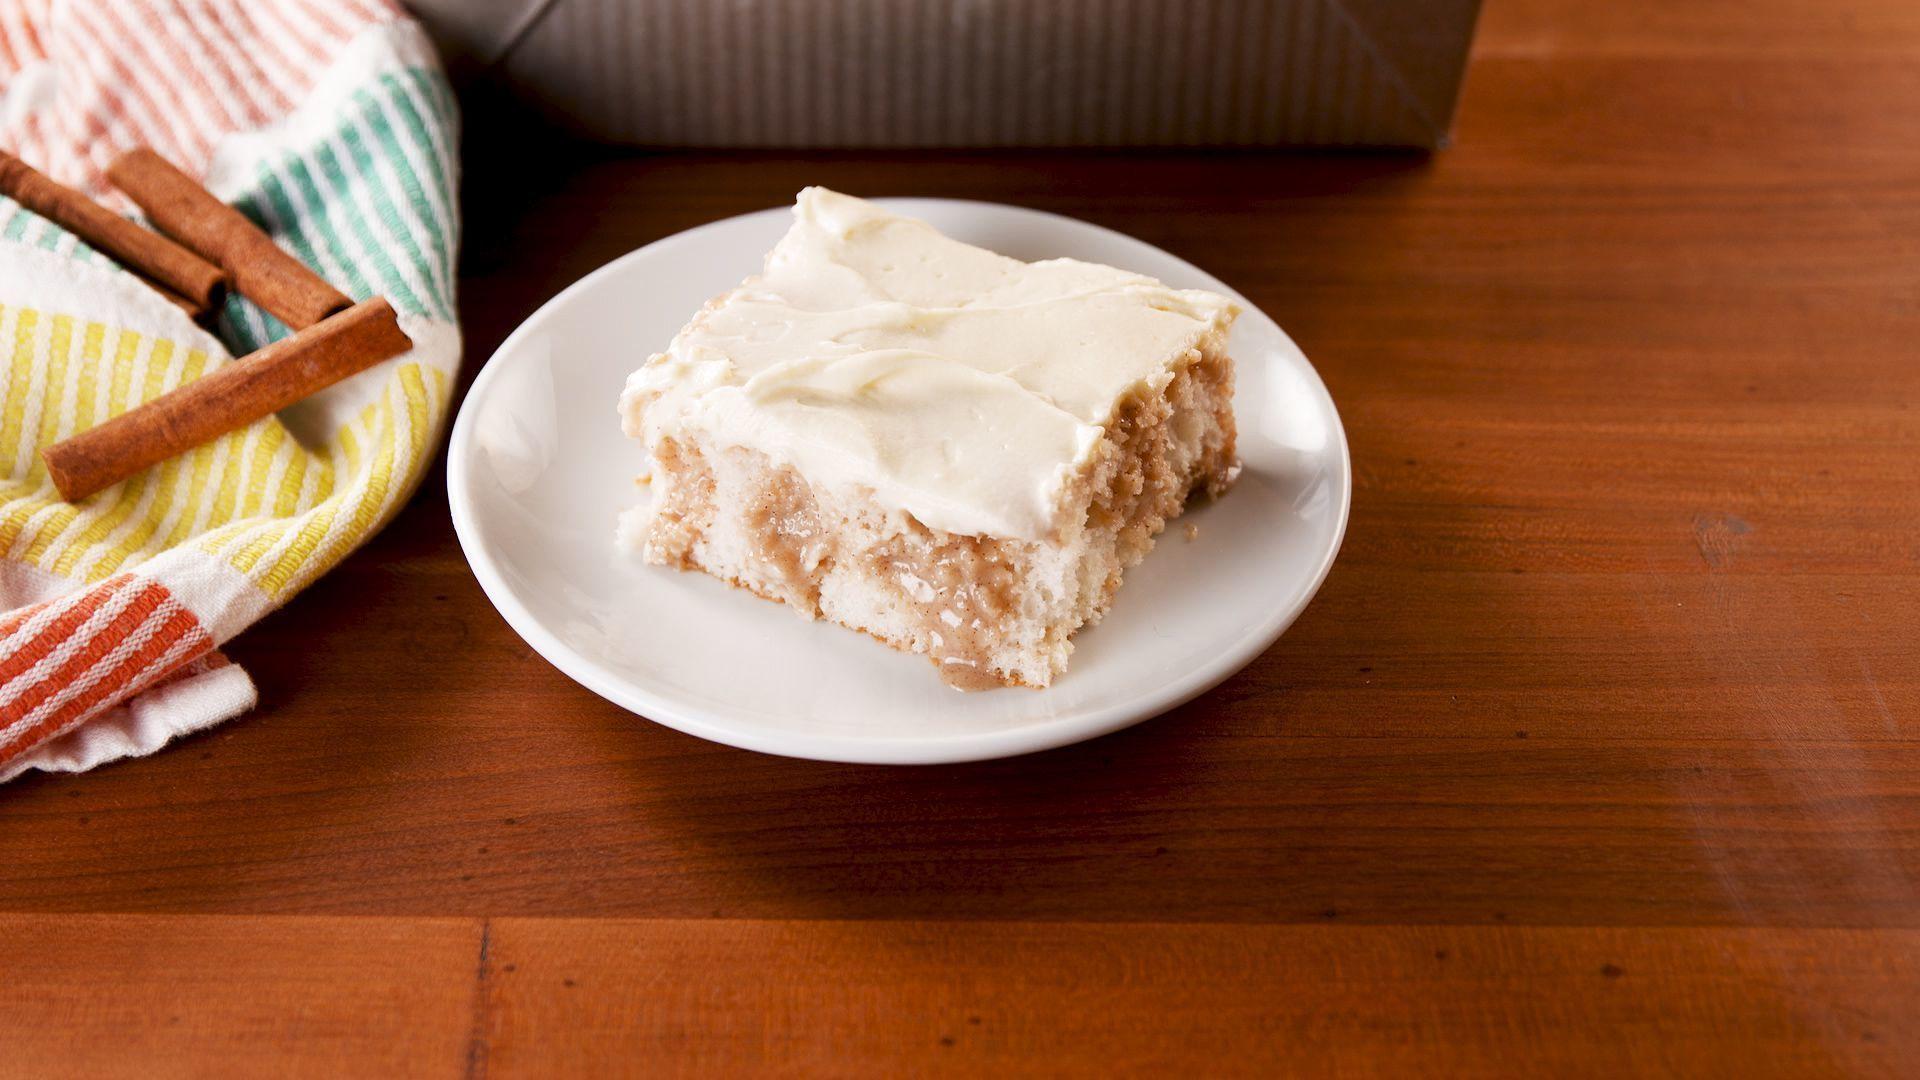 Cinnamon Roll Poke Cake #cinnamonrollpokecake Cinnamon Roll Poke Cake #cinnamonrollpokecake Cinnamon Roll Poke Cake #cinnamonrollpokecake Cinnamon Roll Poke Cake #cinnamonrollpokecake